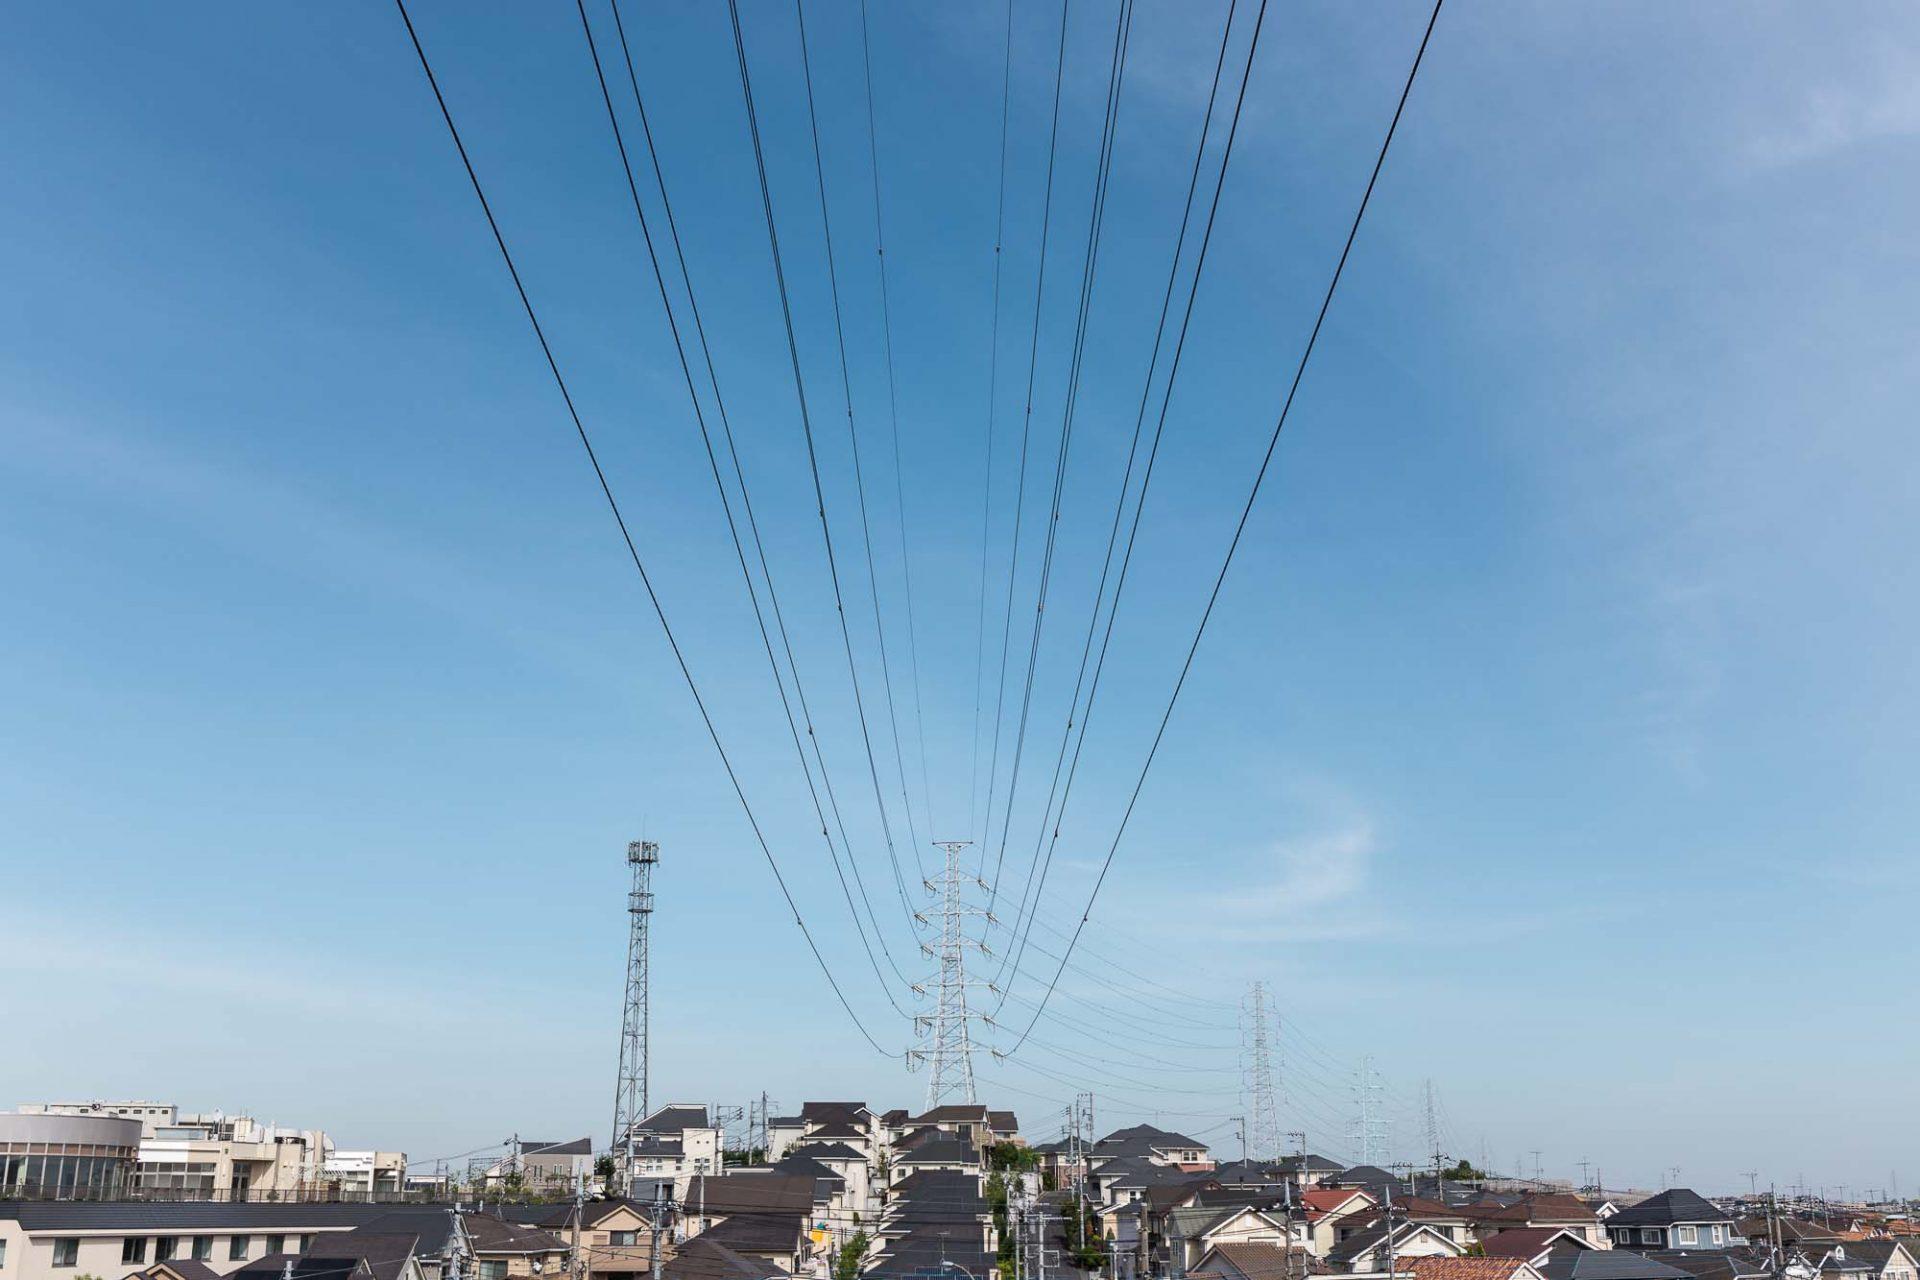 高圧線の鉄塔と電線